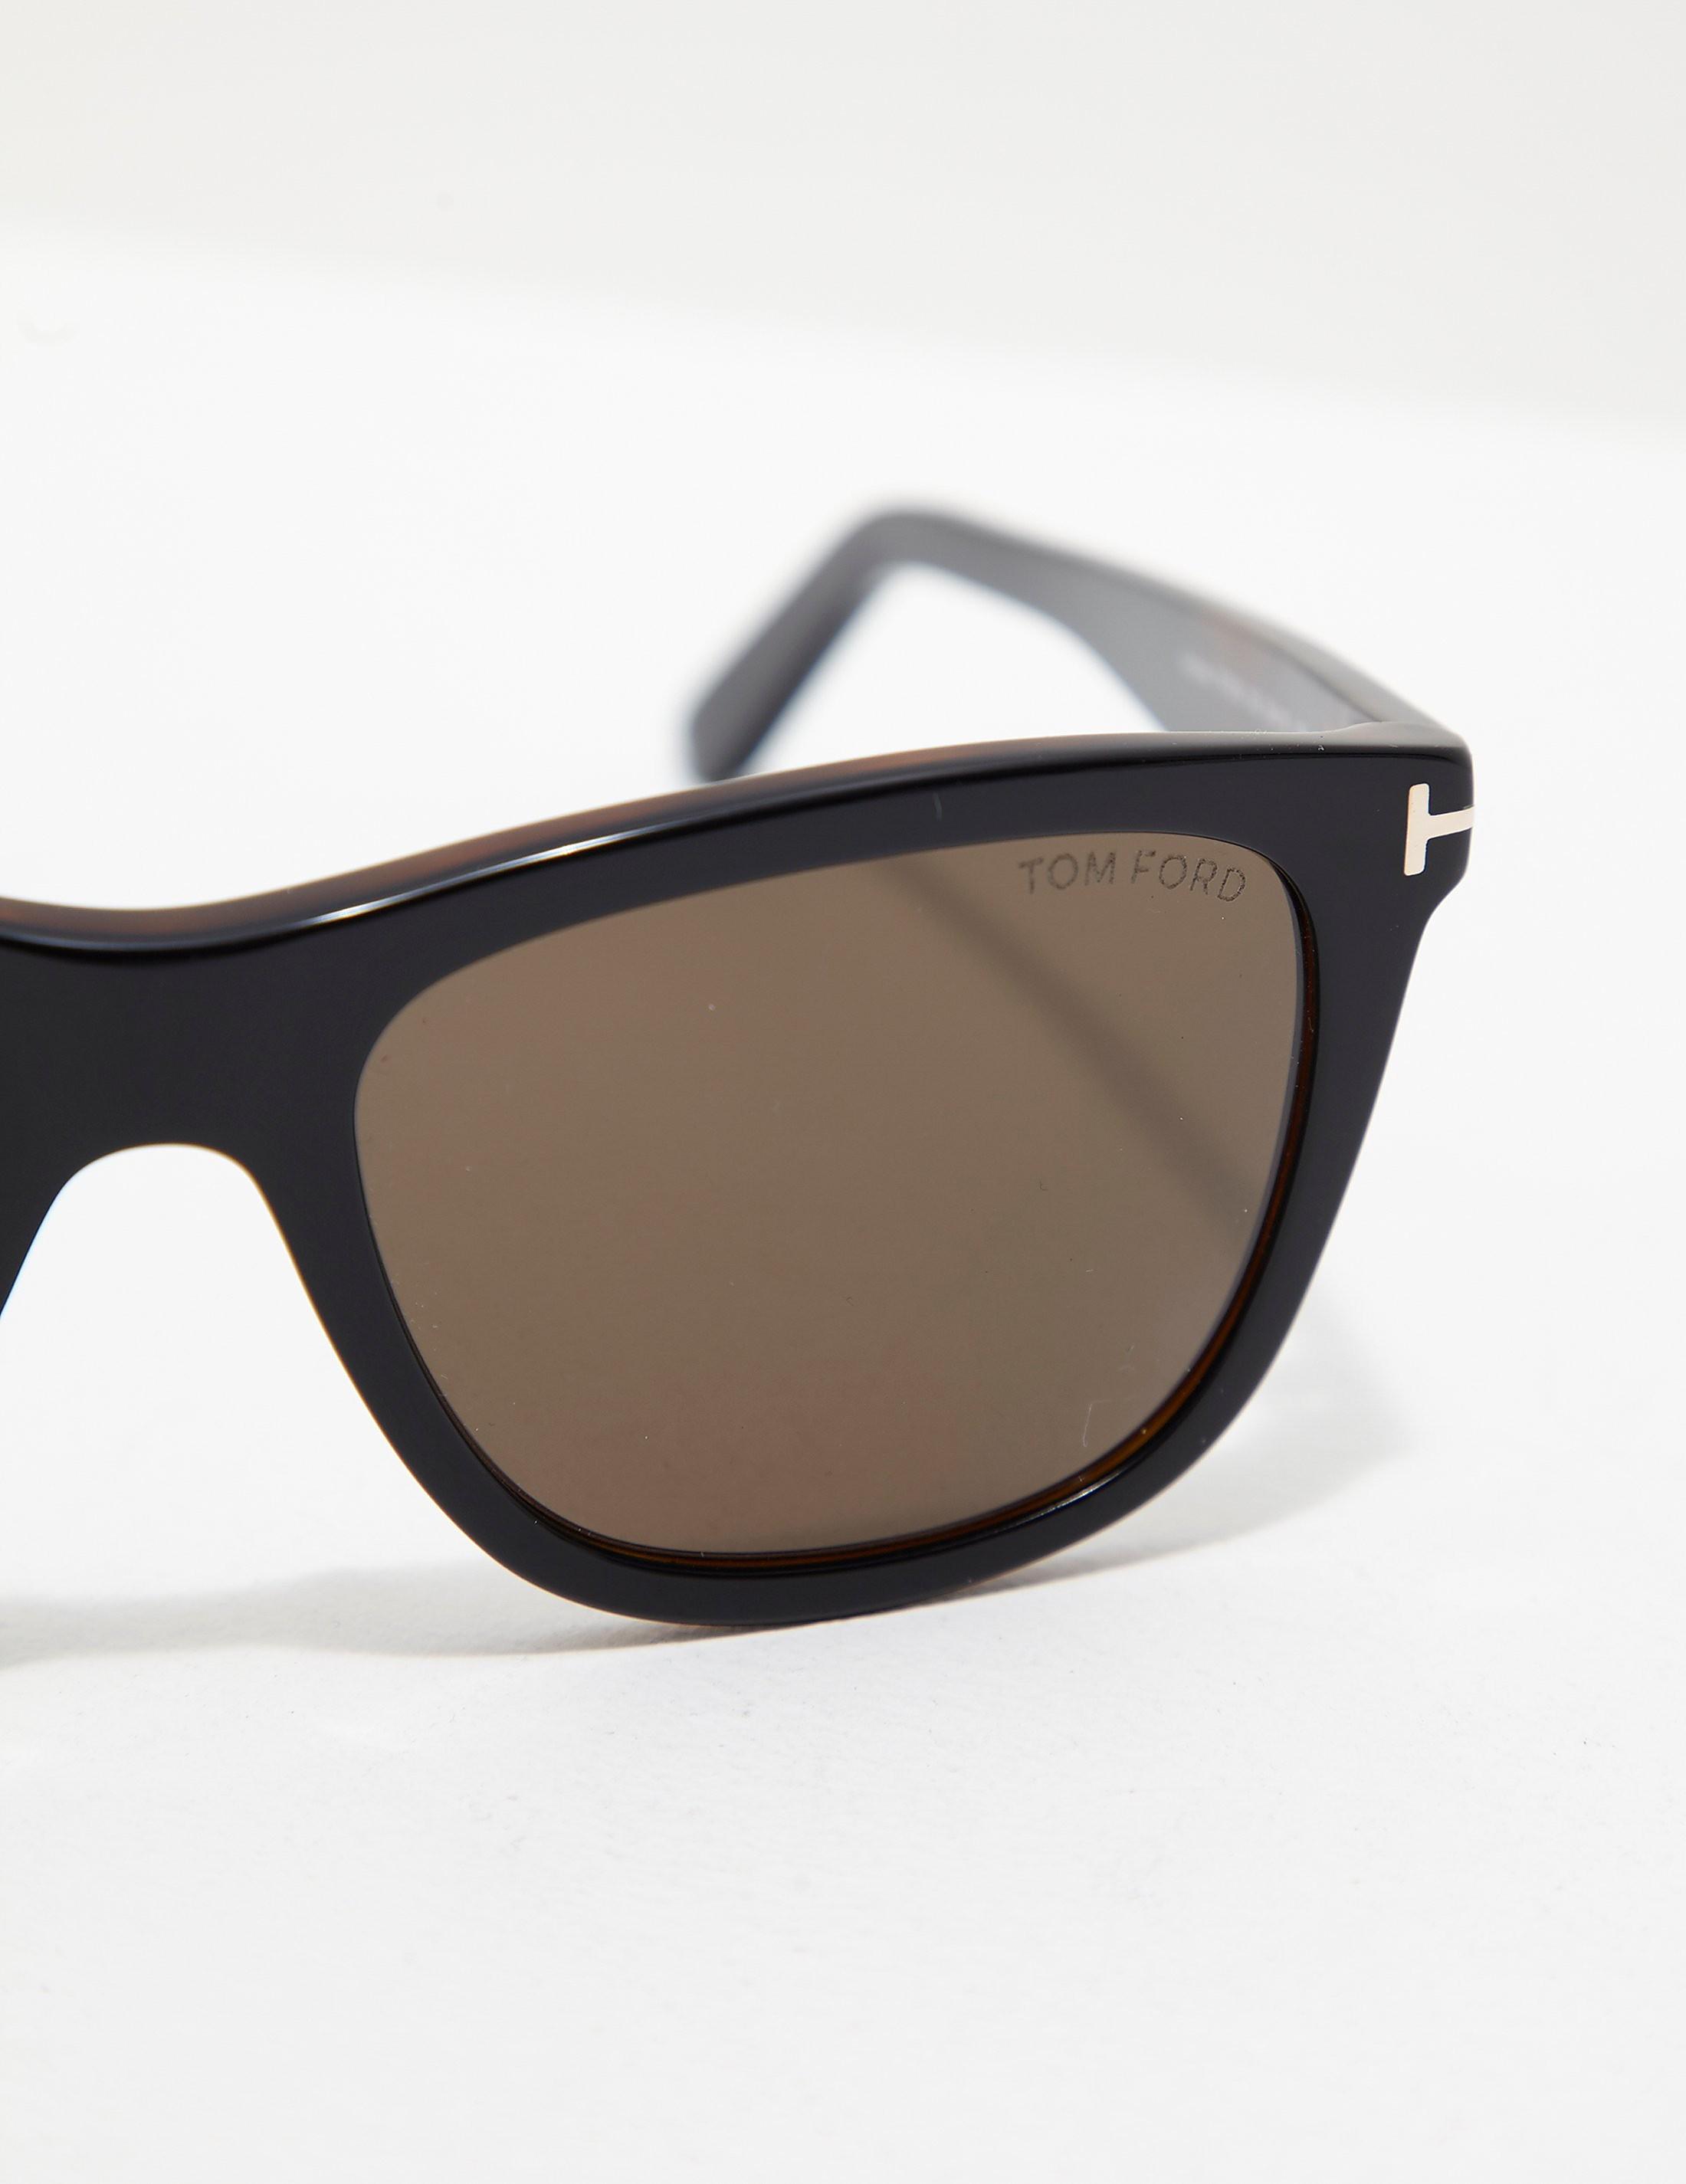 TOM FORD Andrew Sunglasses